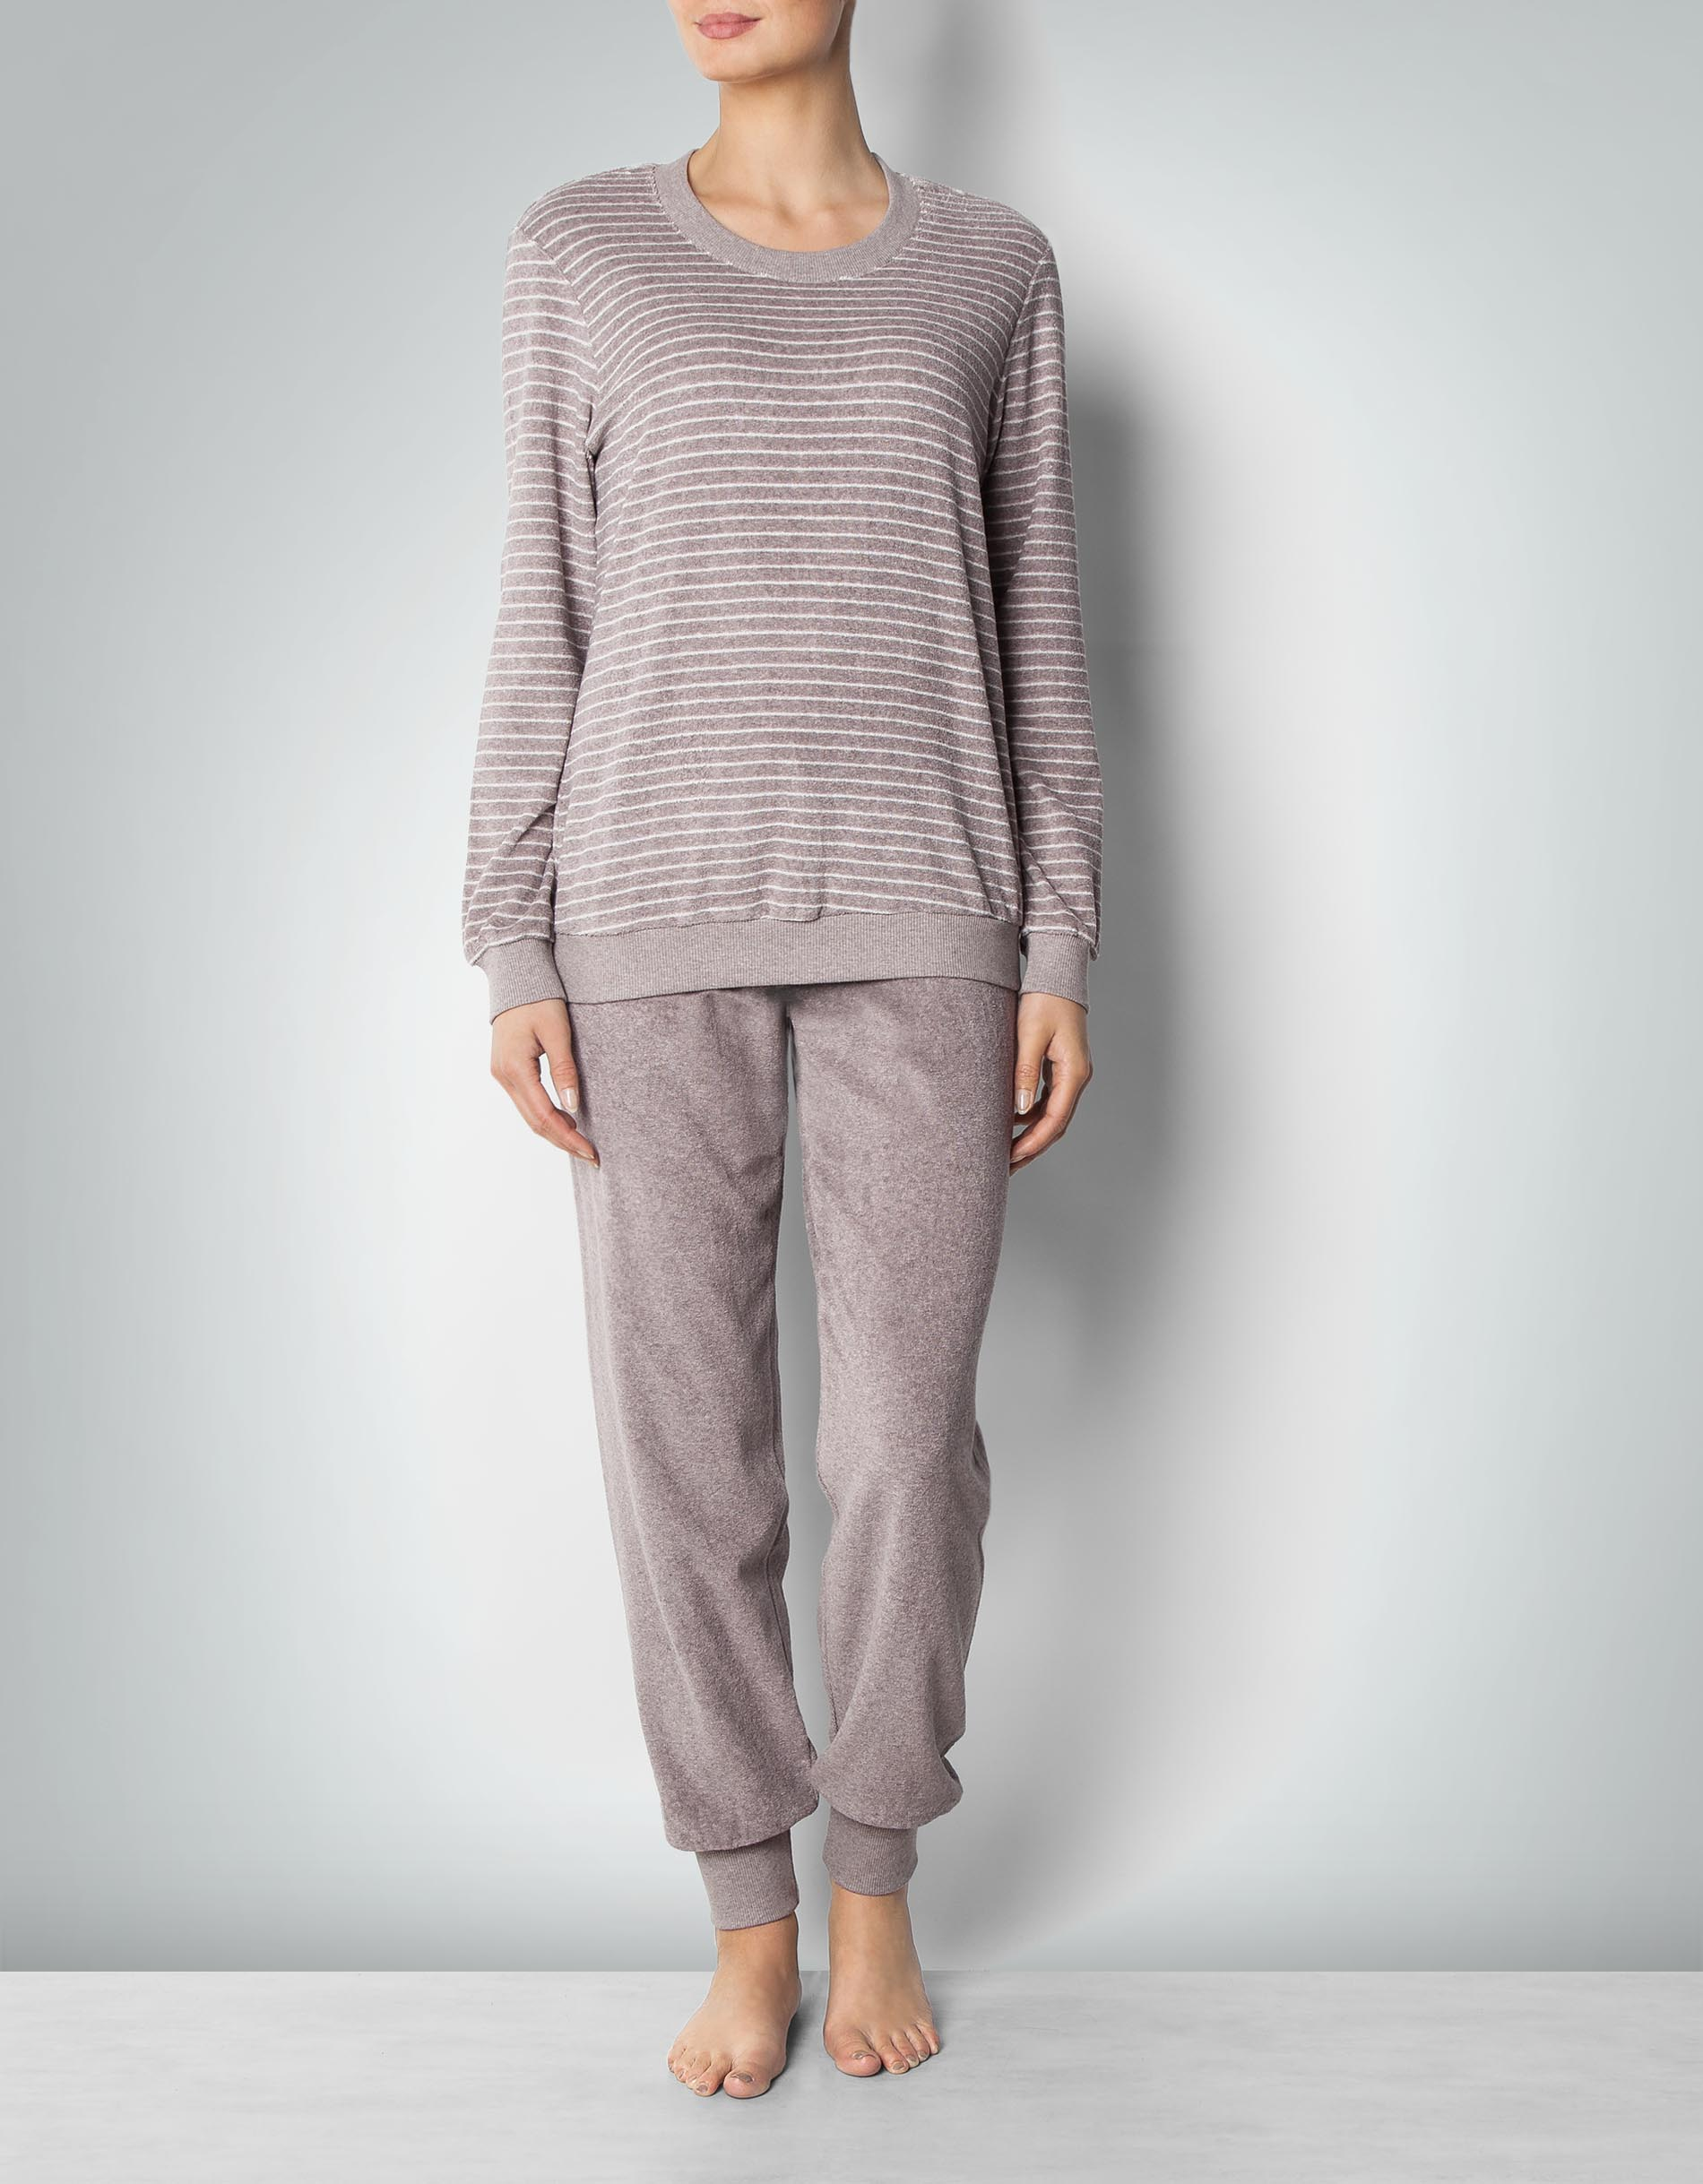 später Entdecken verkauft Schiesser Damen Pyjama lang in Frottee-Qualität empfohlen ...